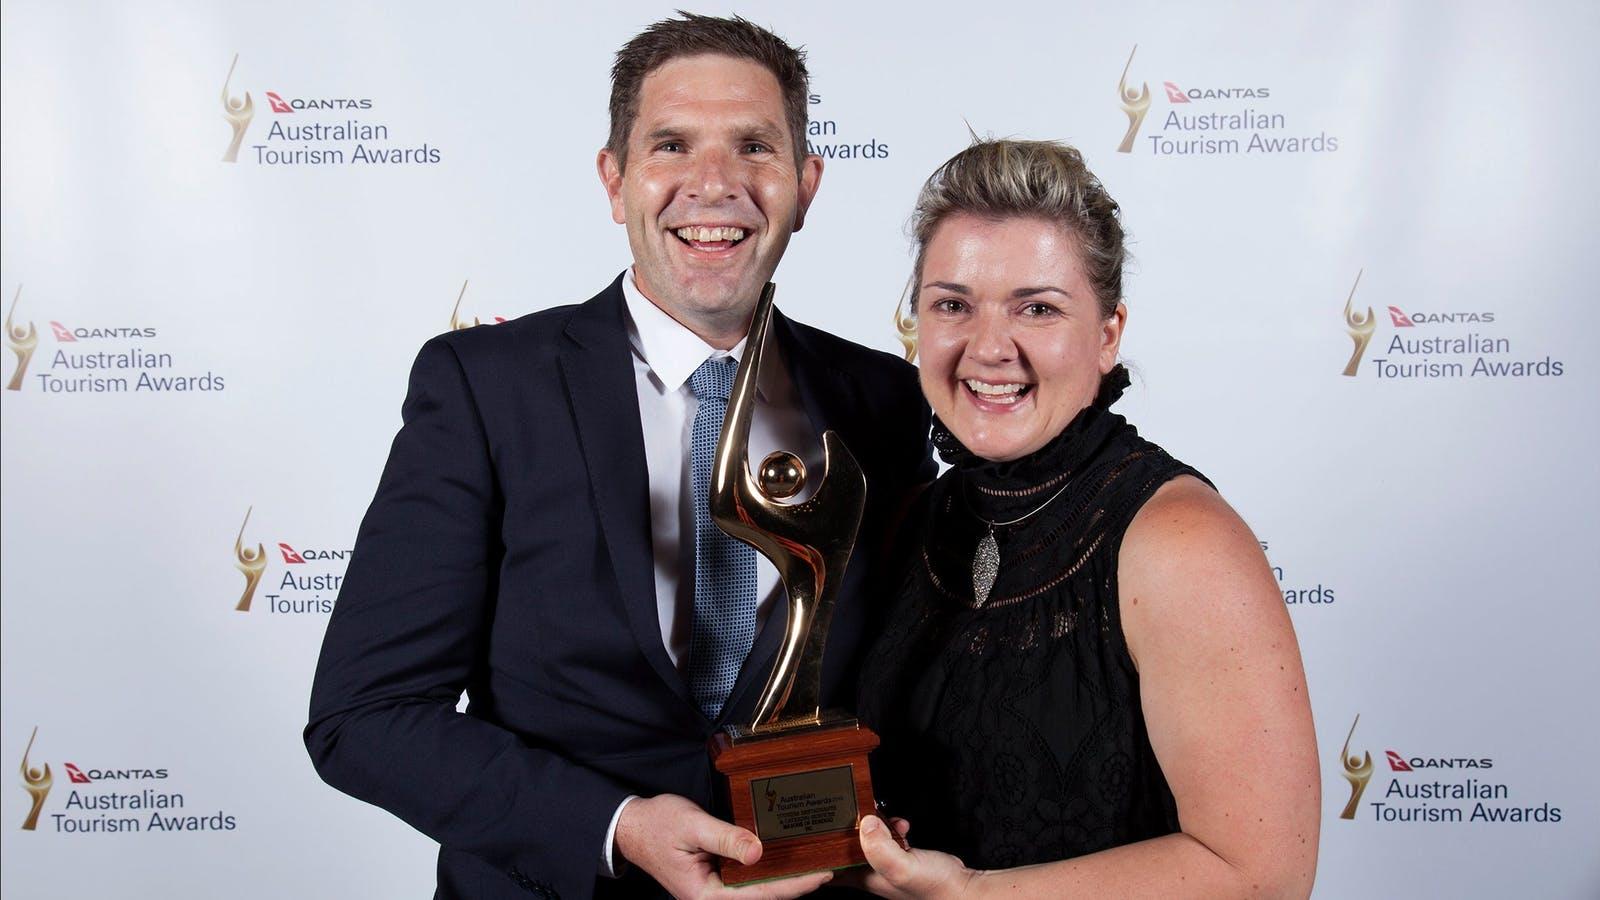 2016 Gold winners, Australian Tourism Awards